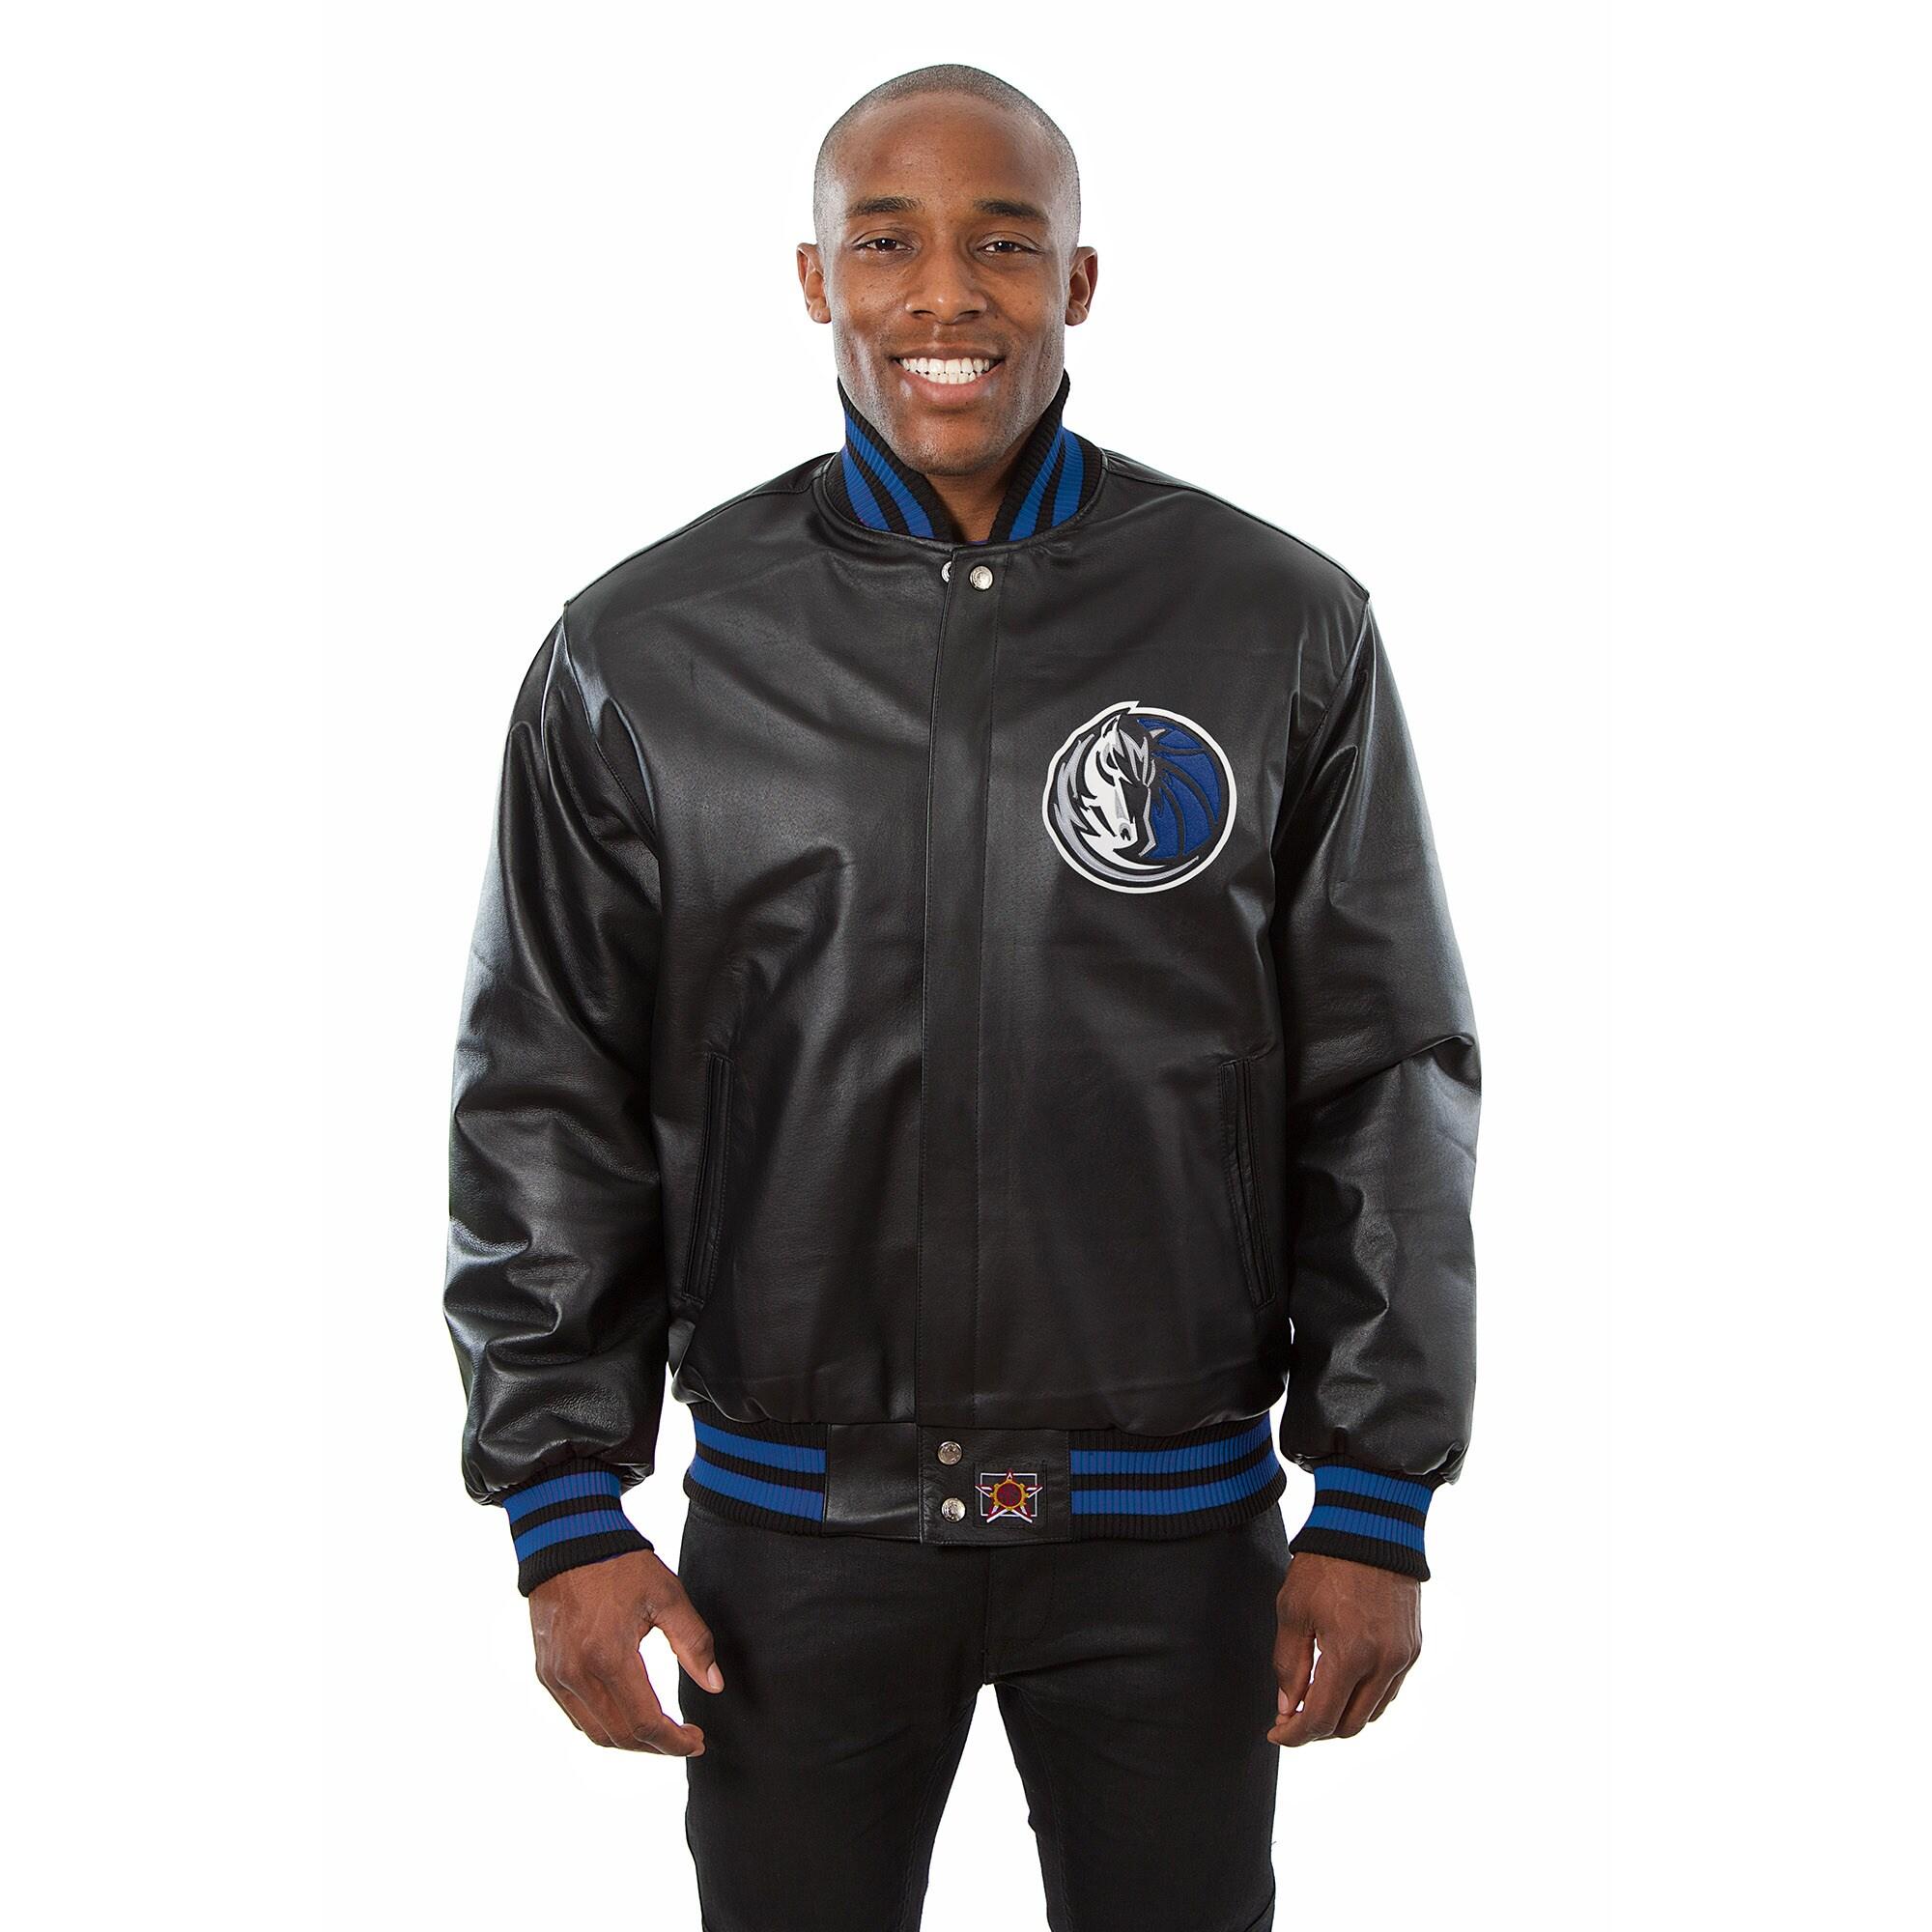 Dallas Mavericks JH Design Domestic Team Color Leather Jacket - Black